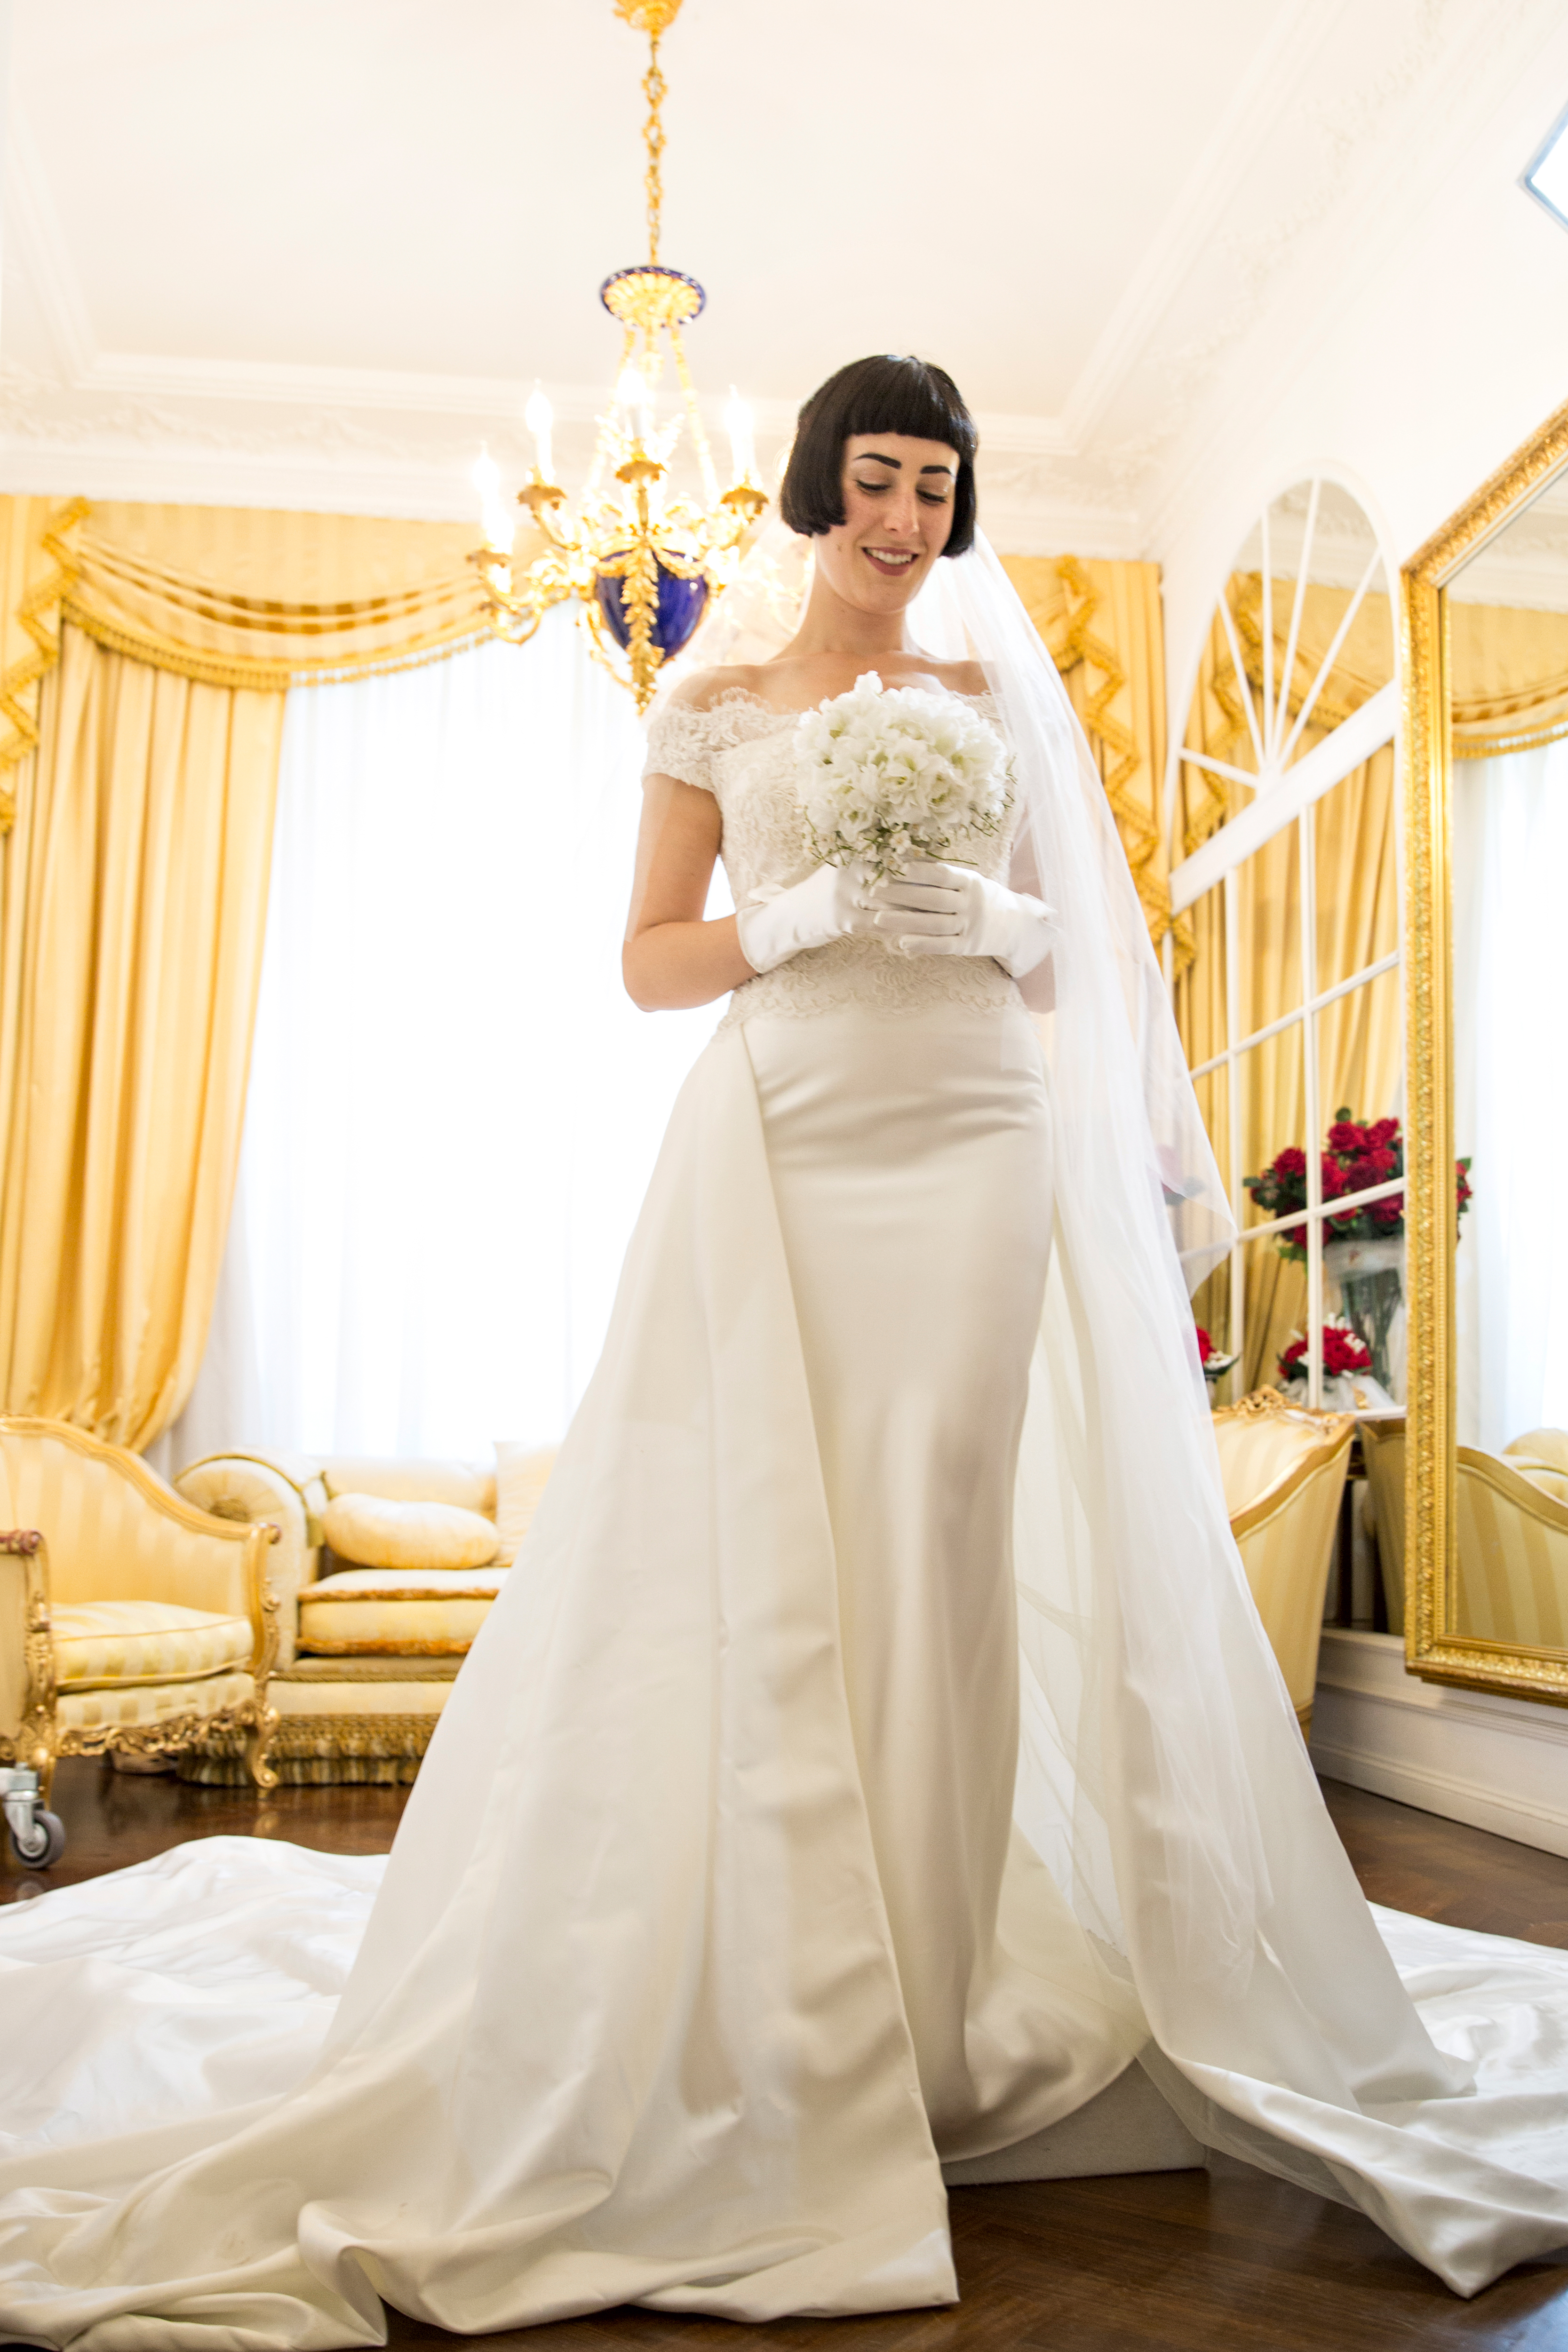 paola d'onofrio spose